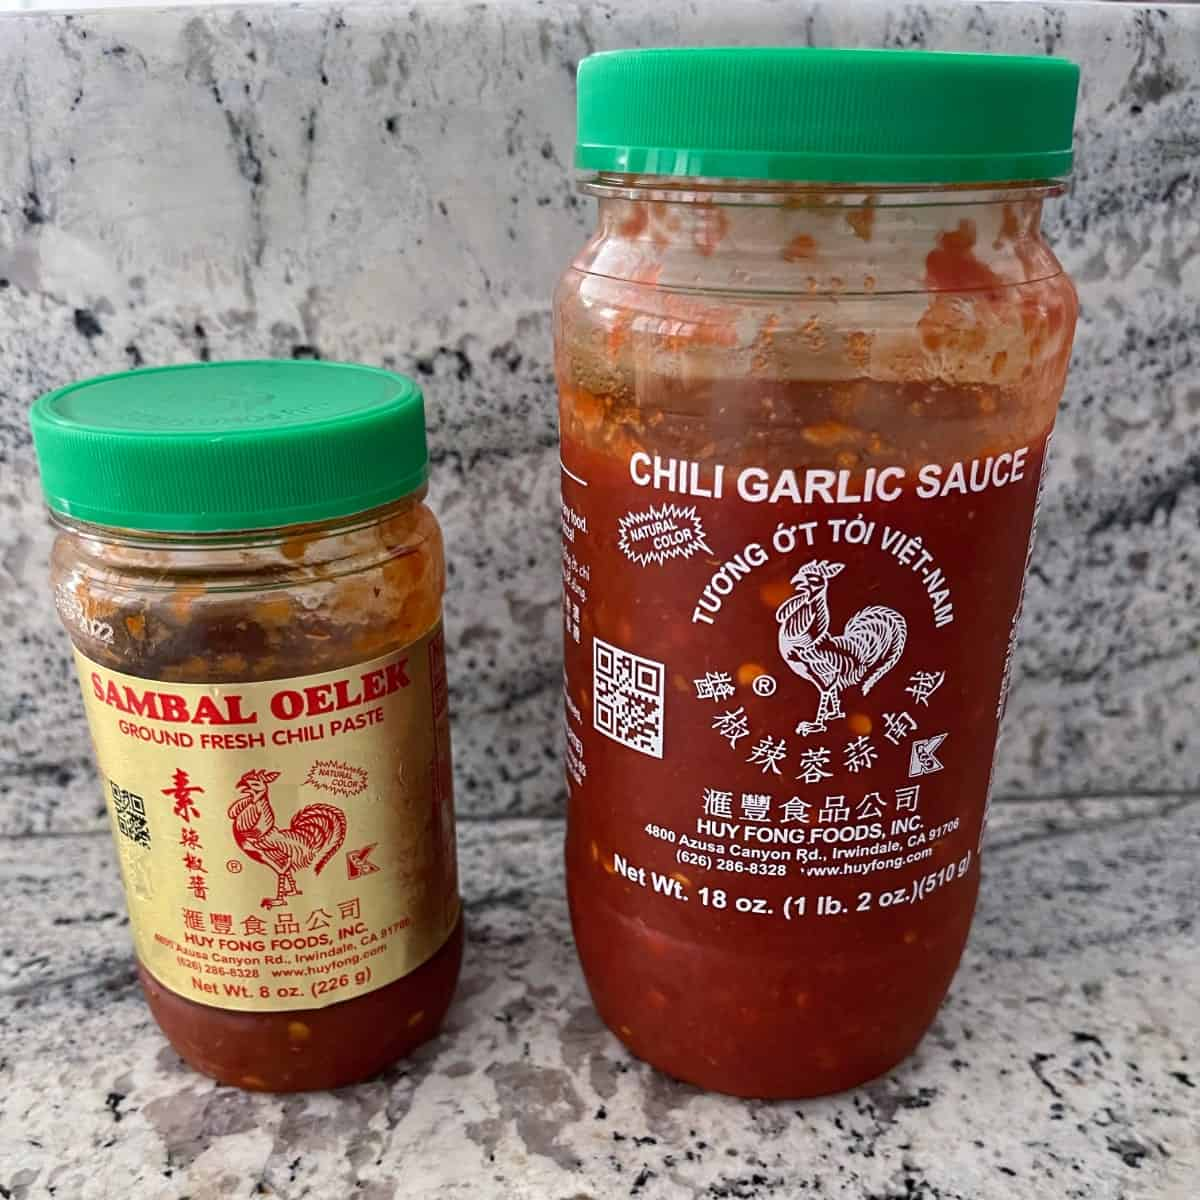 Bottle of Sambal Oelek next to bottle of Chili Garlic Sauce on granite counter.